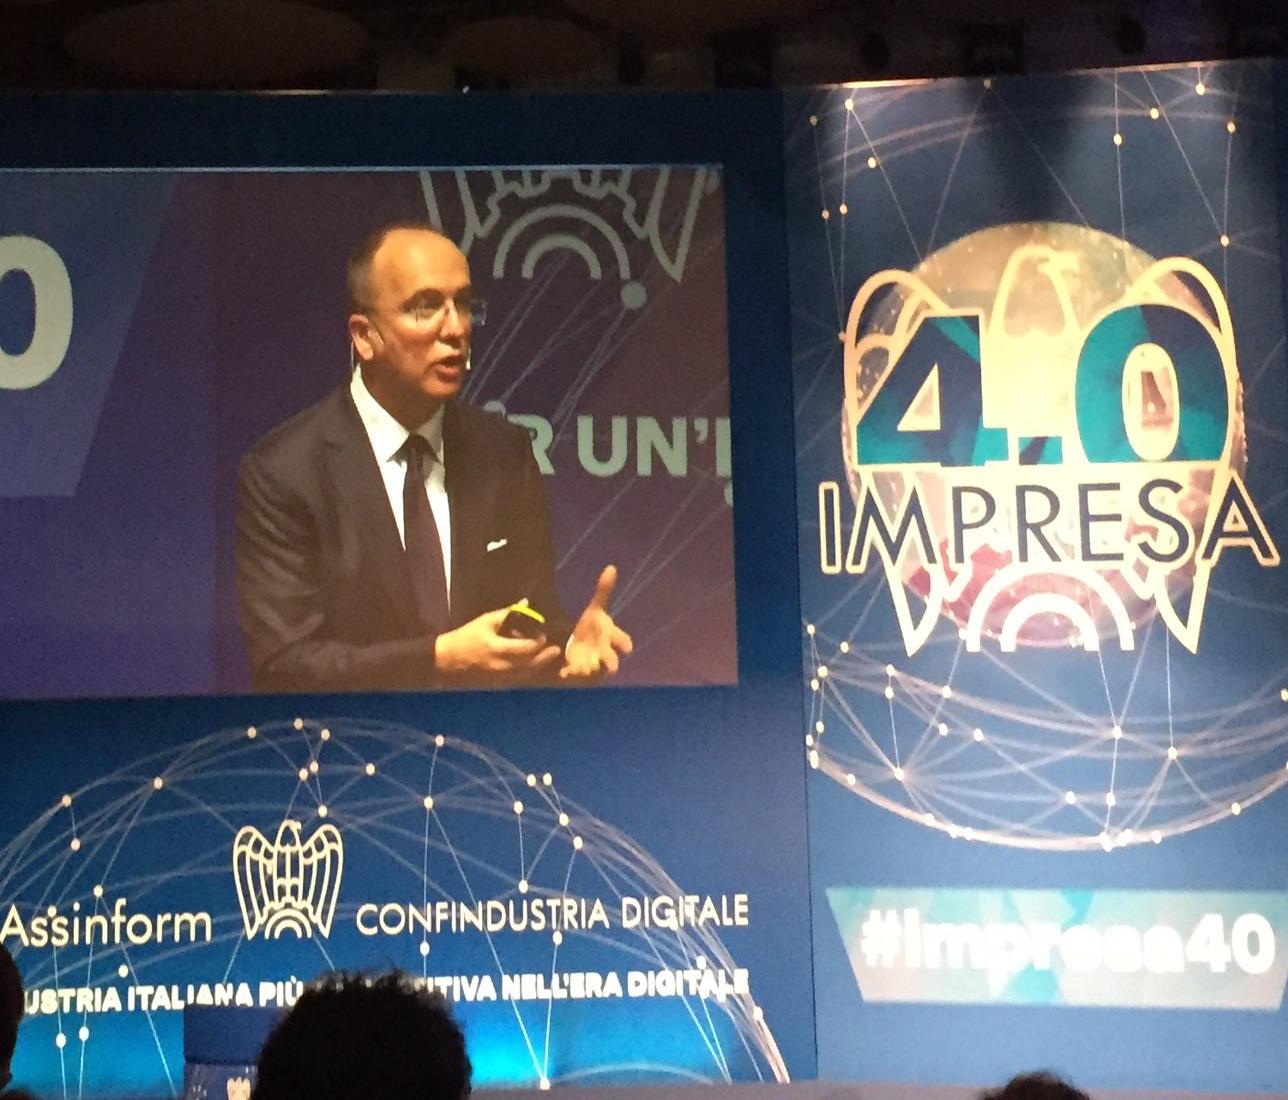 Agostino Santoni, Presidente di Assinform, introduce l'evento ''Impresa 4.0'' a Milano